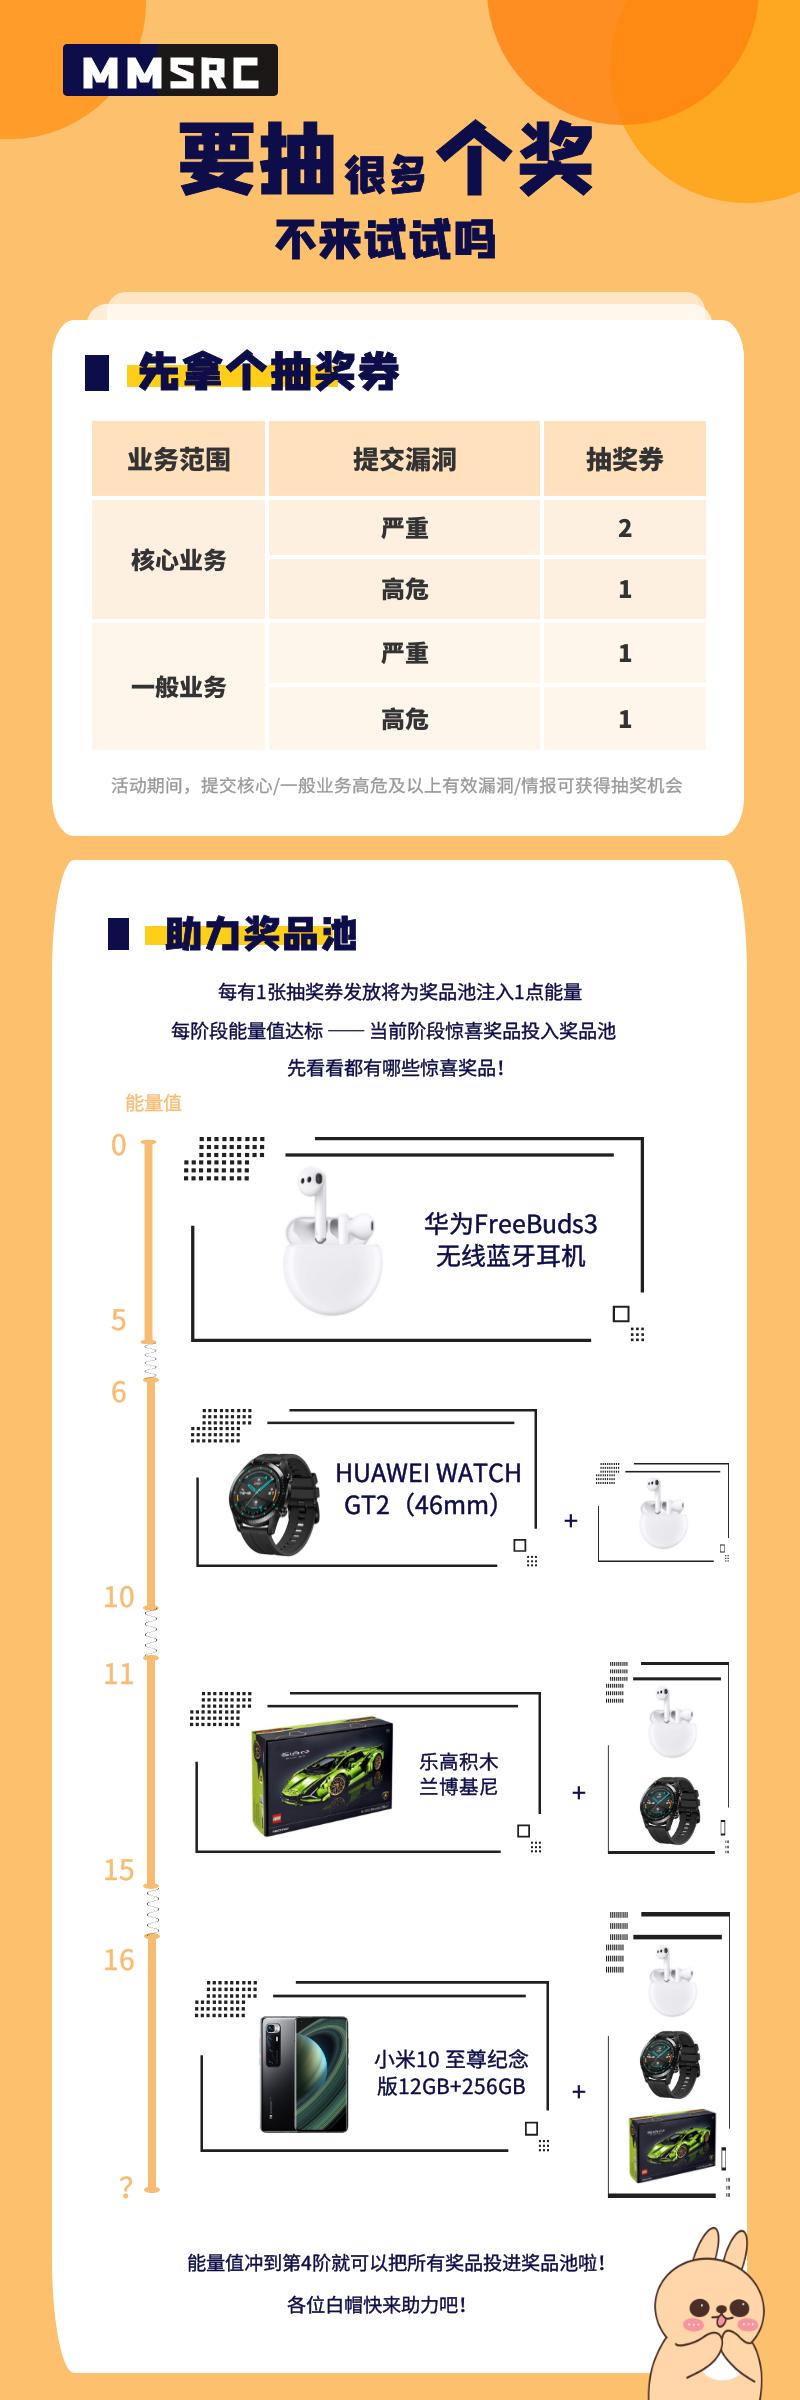 https://momo-mmsrc.oss-cn-hangzhou.aliyuncs.com/img-bf90a480-1f9a-399c-97b8-813d0dd0f111.png